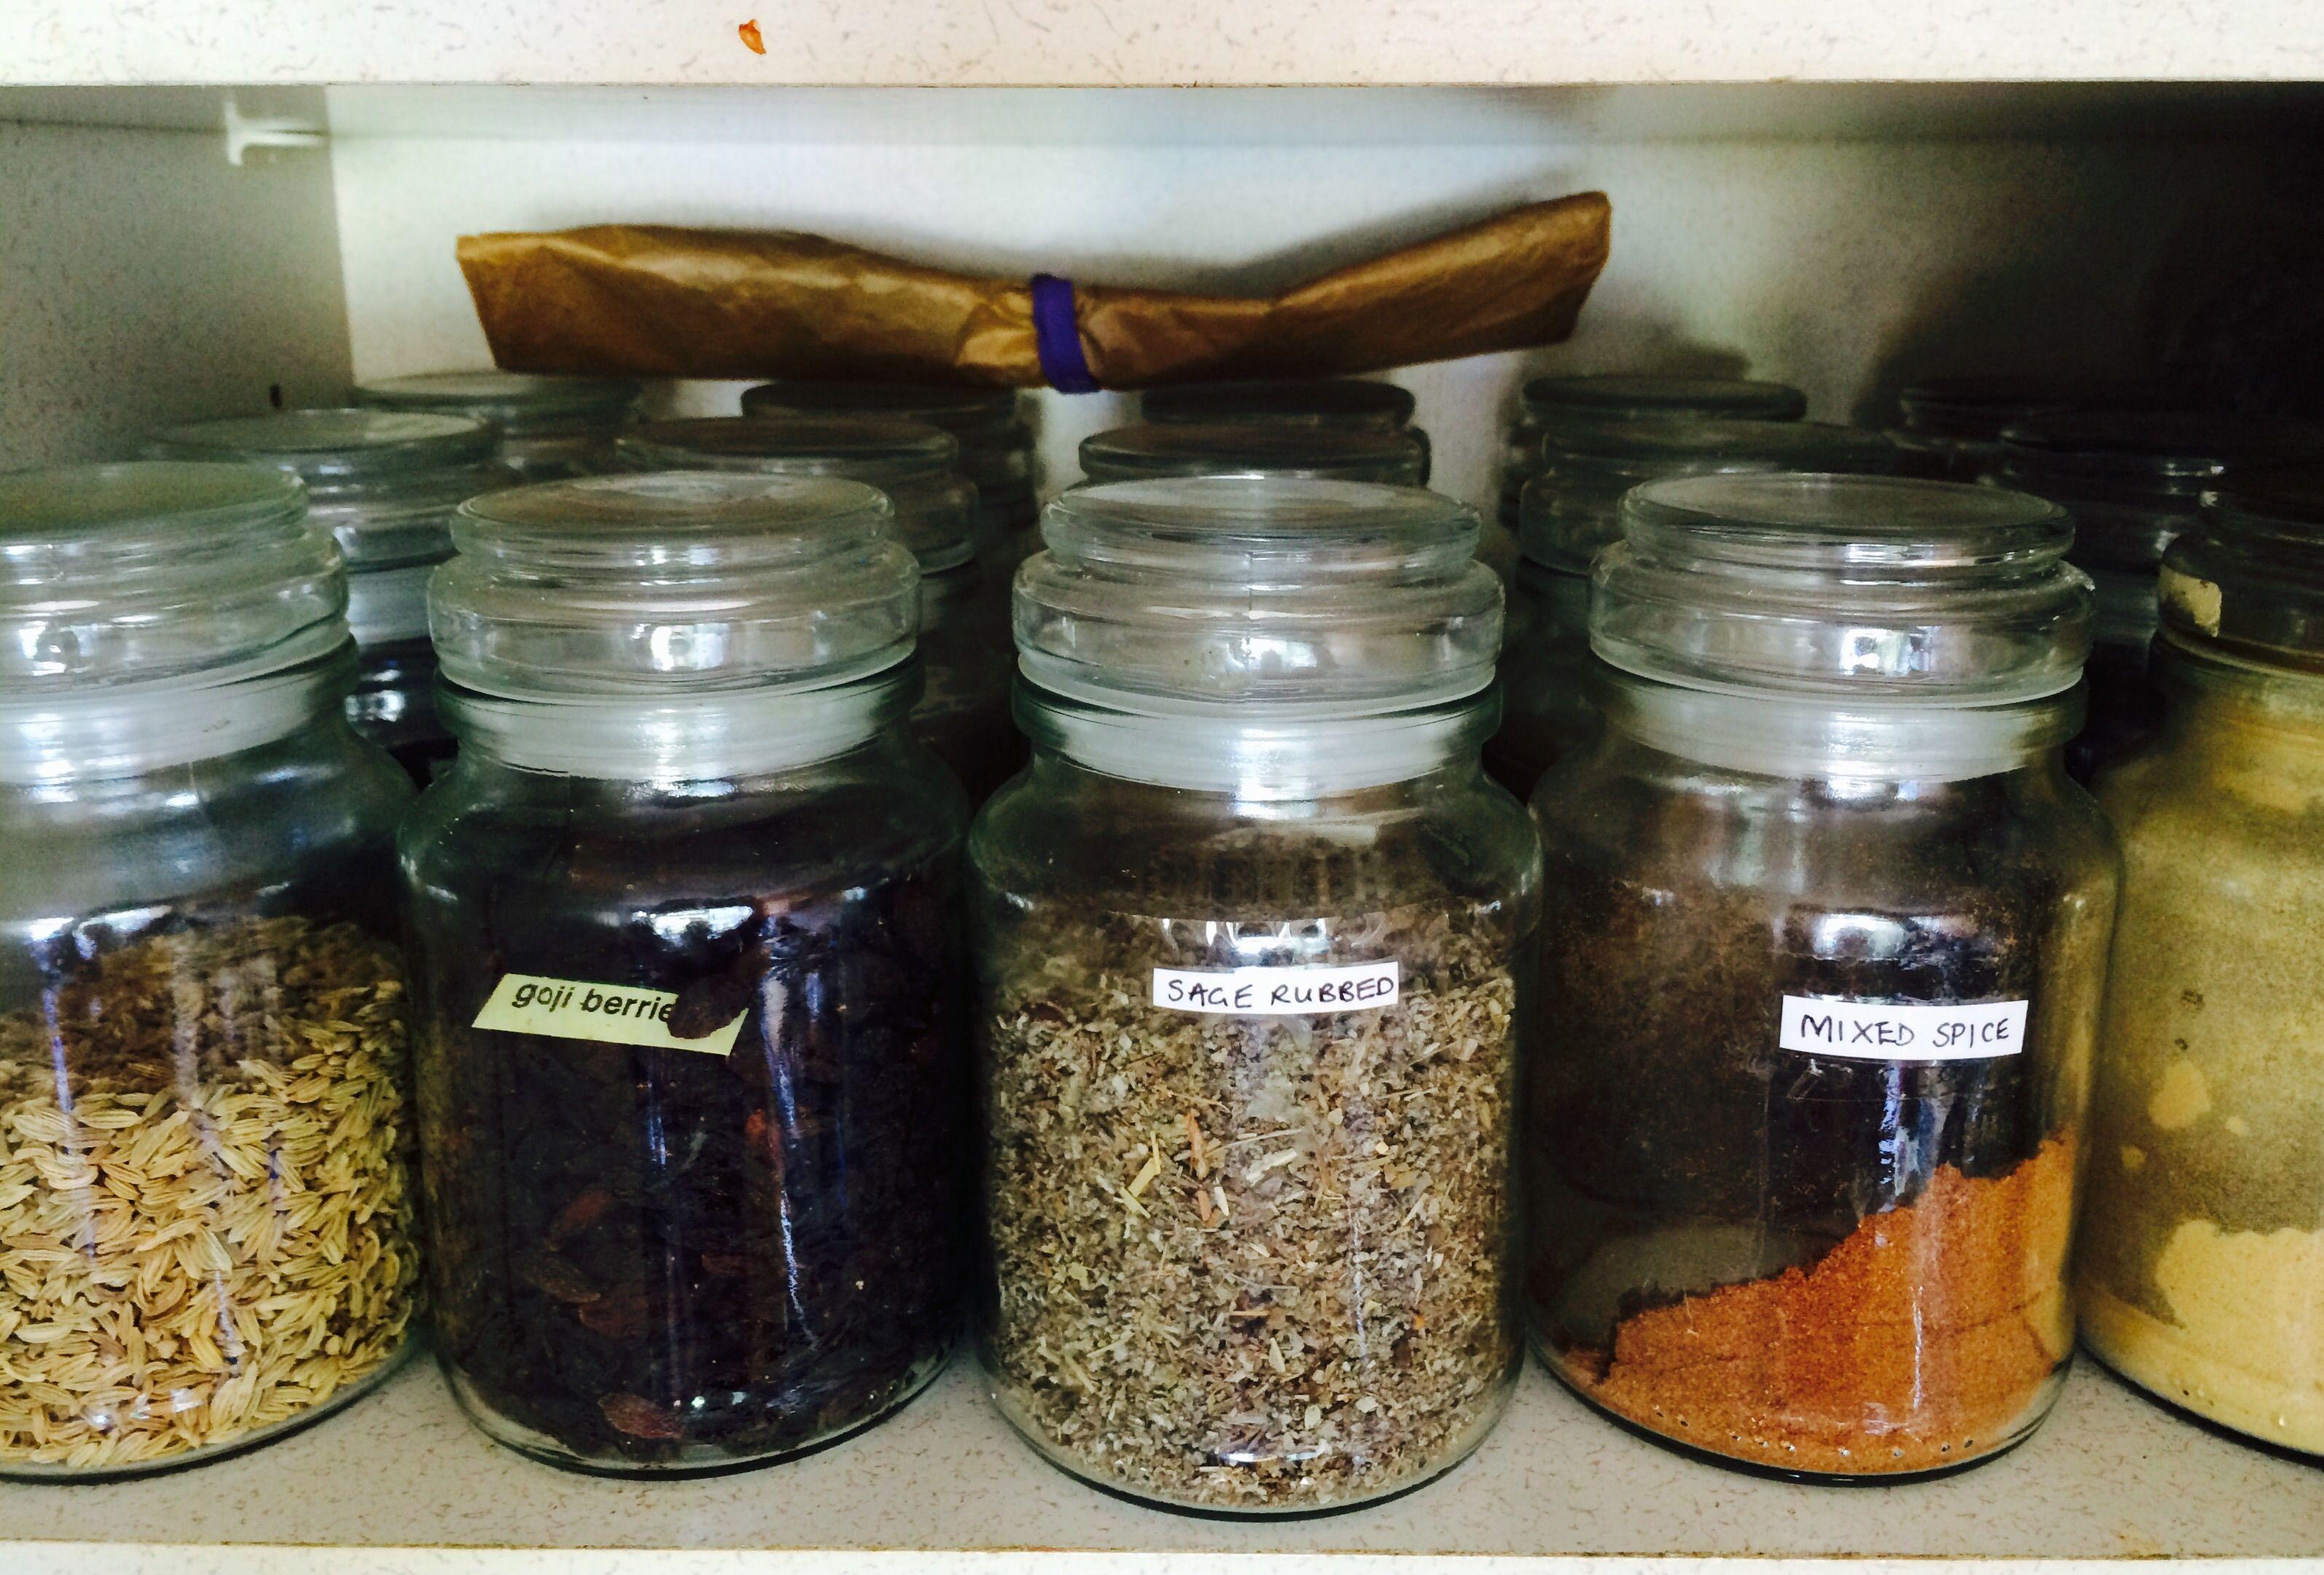 10 Douwe Egberts Re Used Coffee Jars Ideas Coffee Jars Douwe Egberts Jar